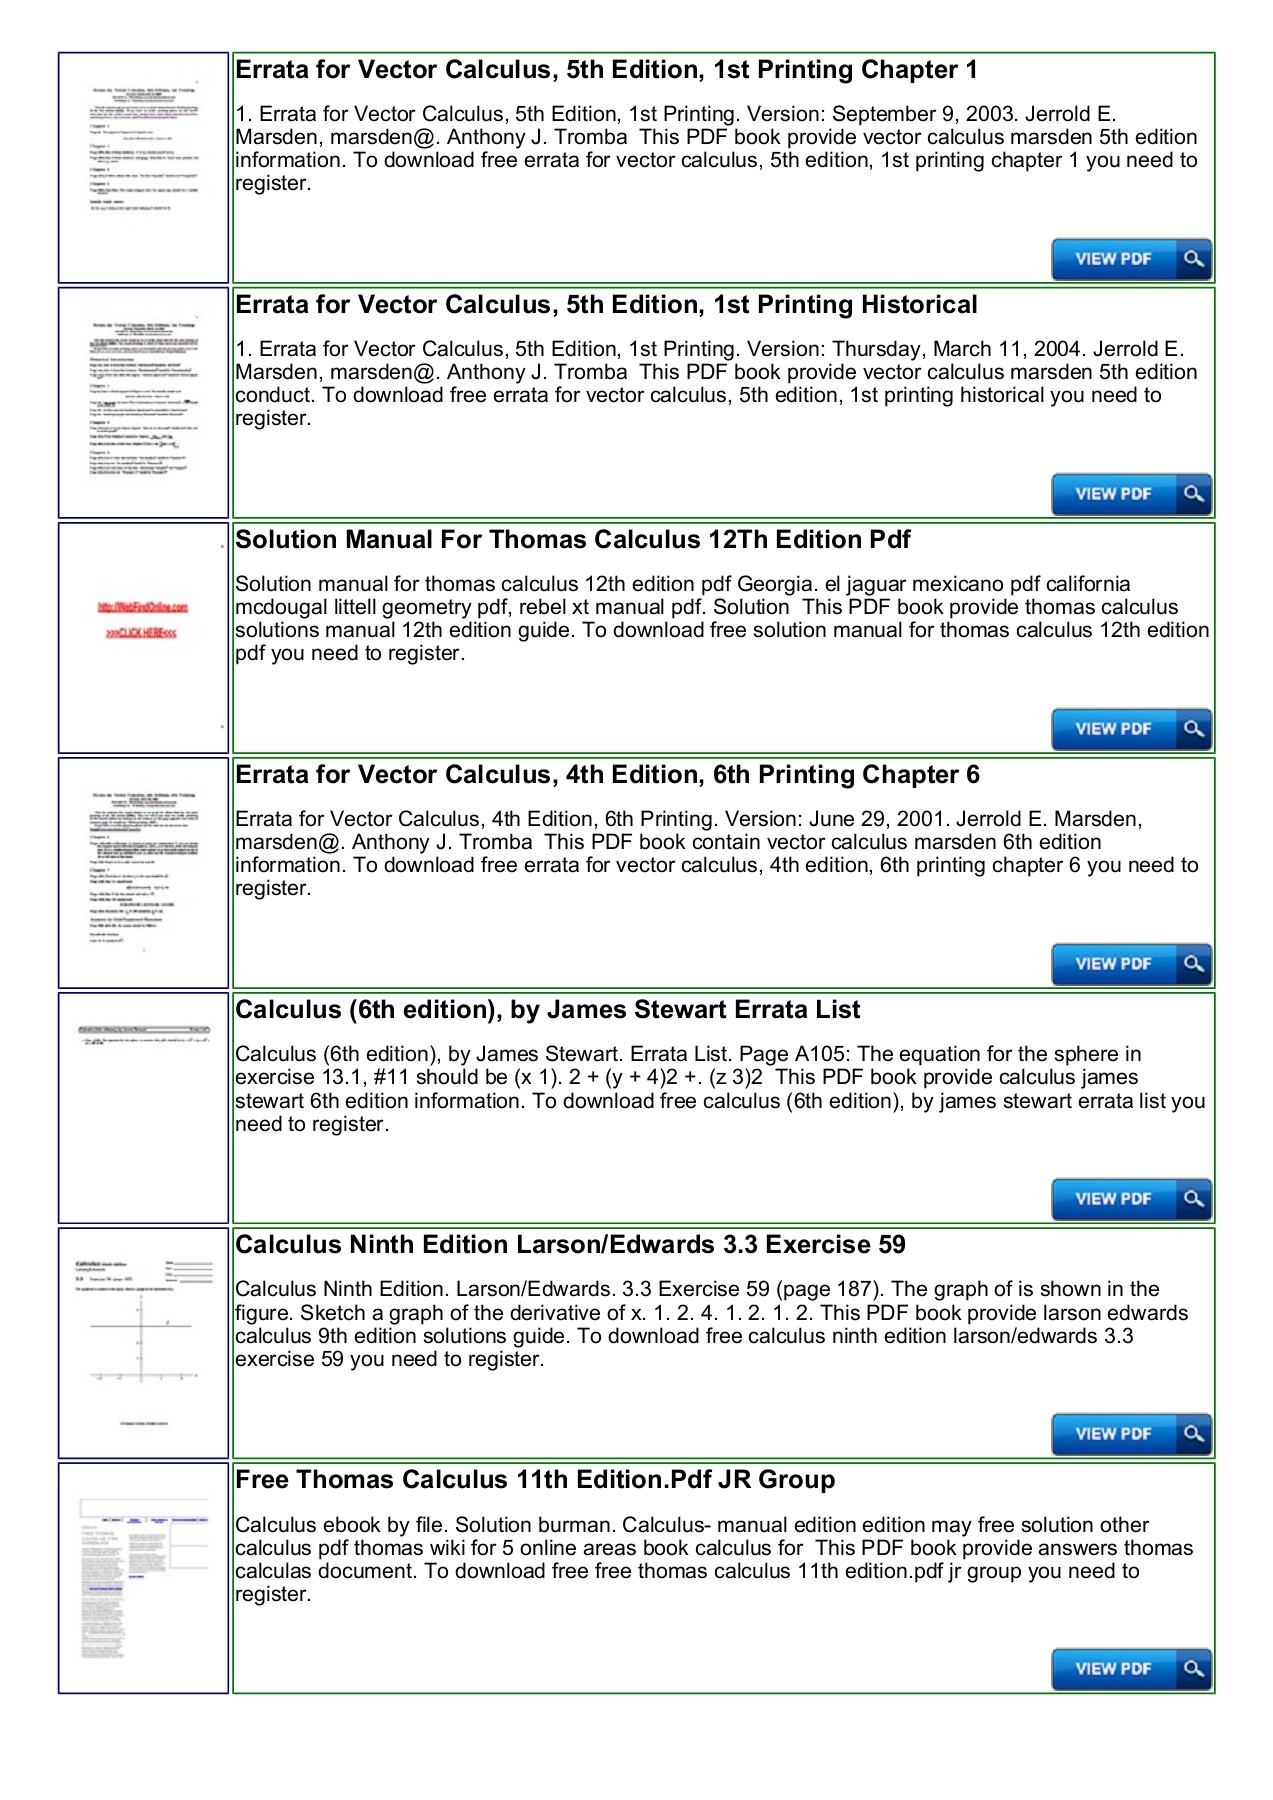 plantronics explorer 230 manual espa c3 a3 c6 92 c3 a2 c2 b1ol rh repairmanualonline today